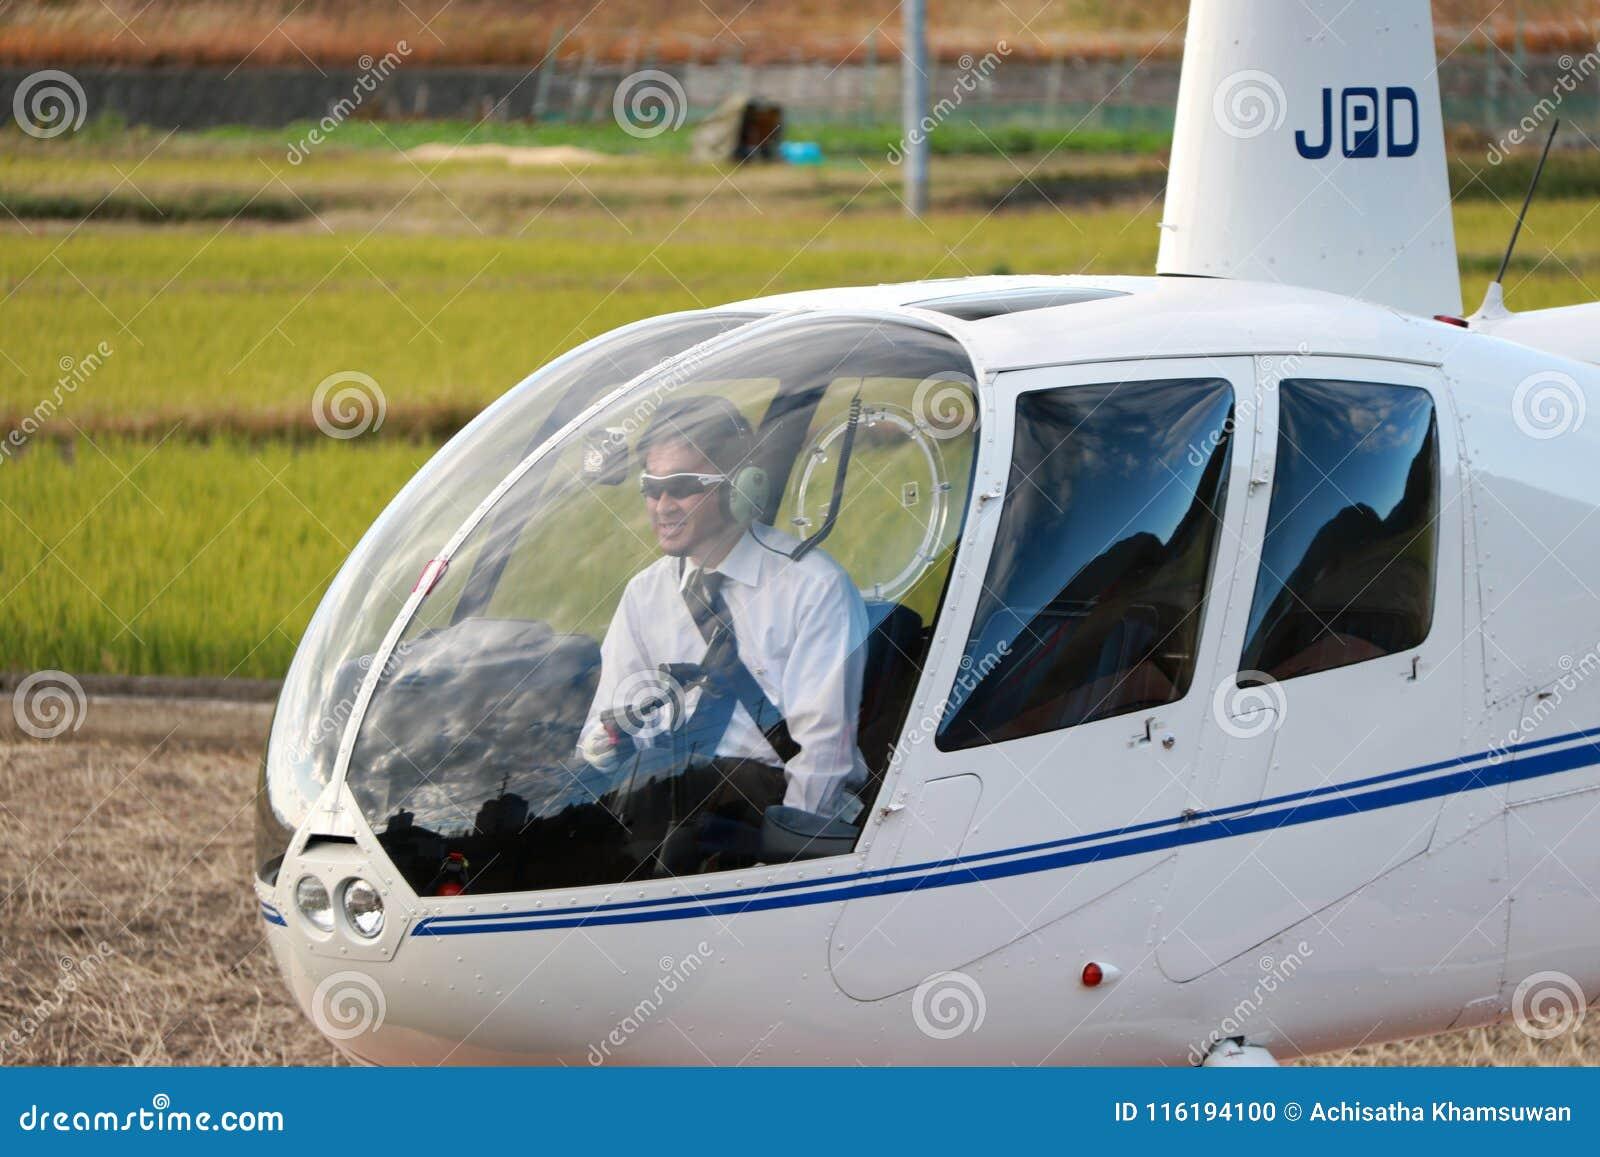 Helikopteru pilot w podróż helikopterze JA002R - ROBINSON R44 kruk od Robinson Helikopter Firma